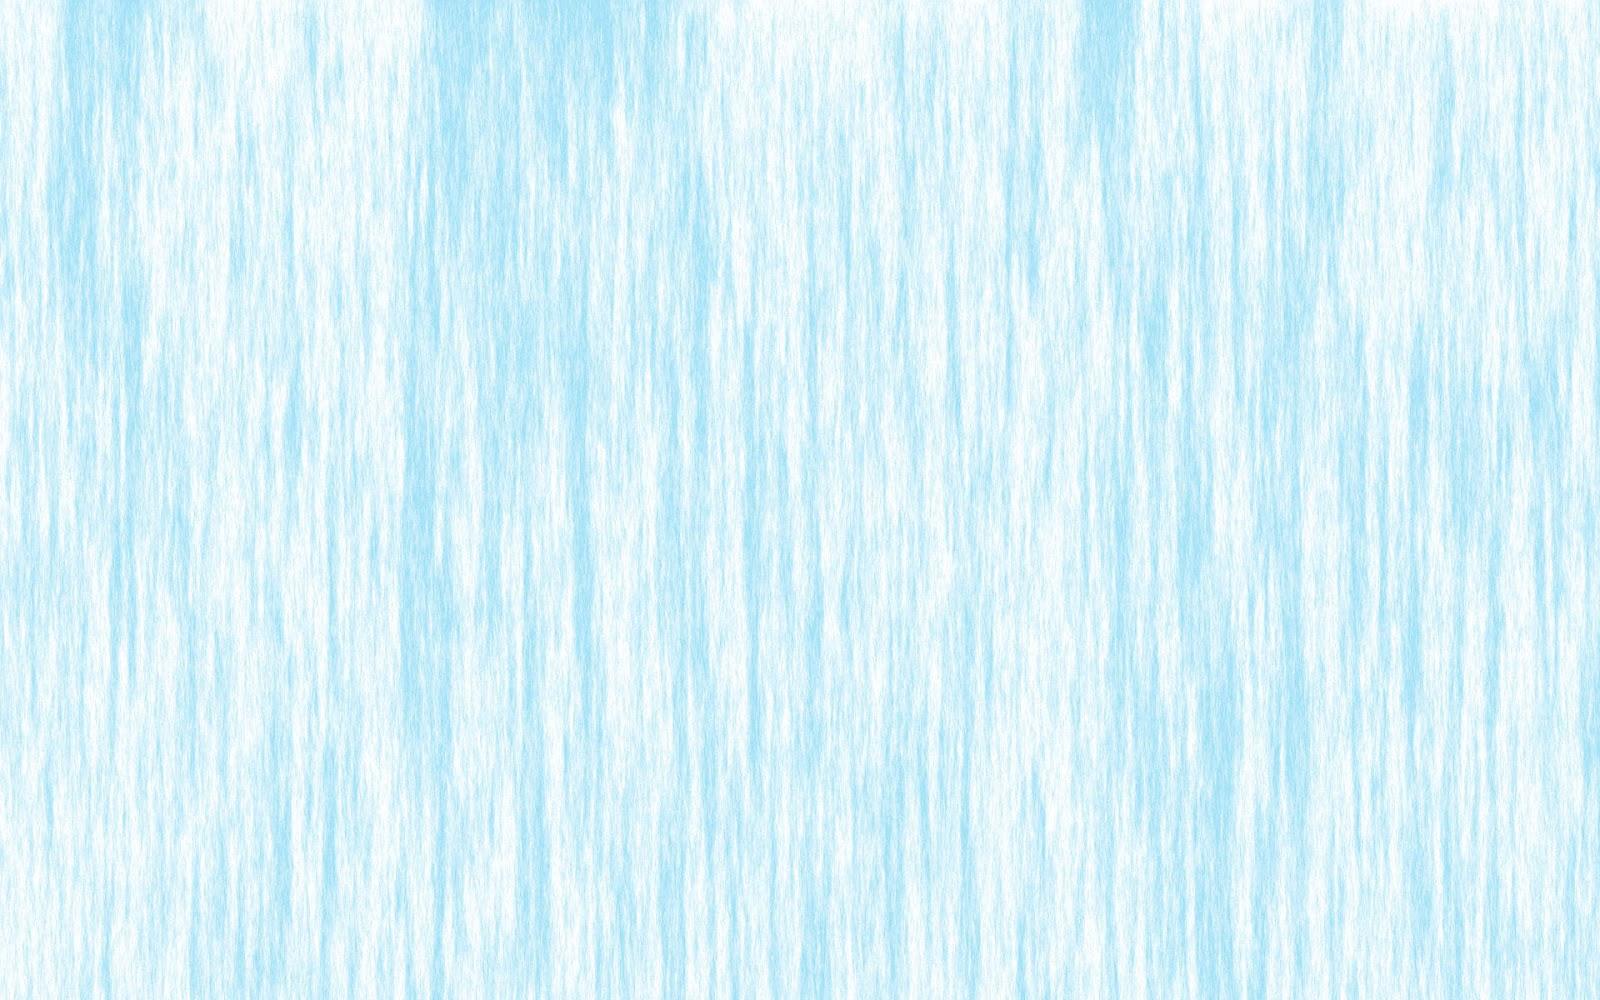 1440 x 2560 wallpaper space galaxy